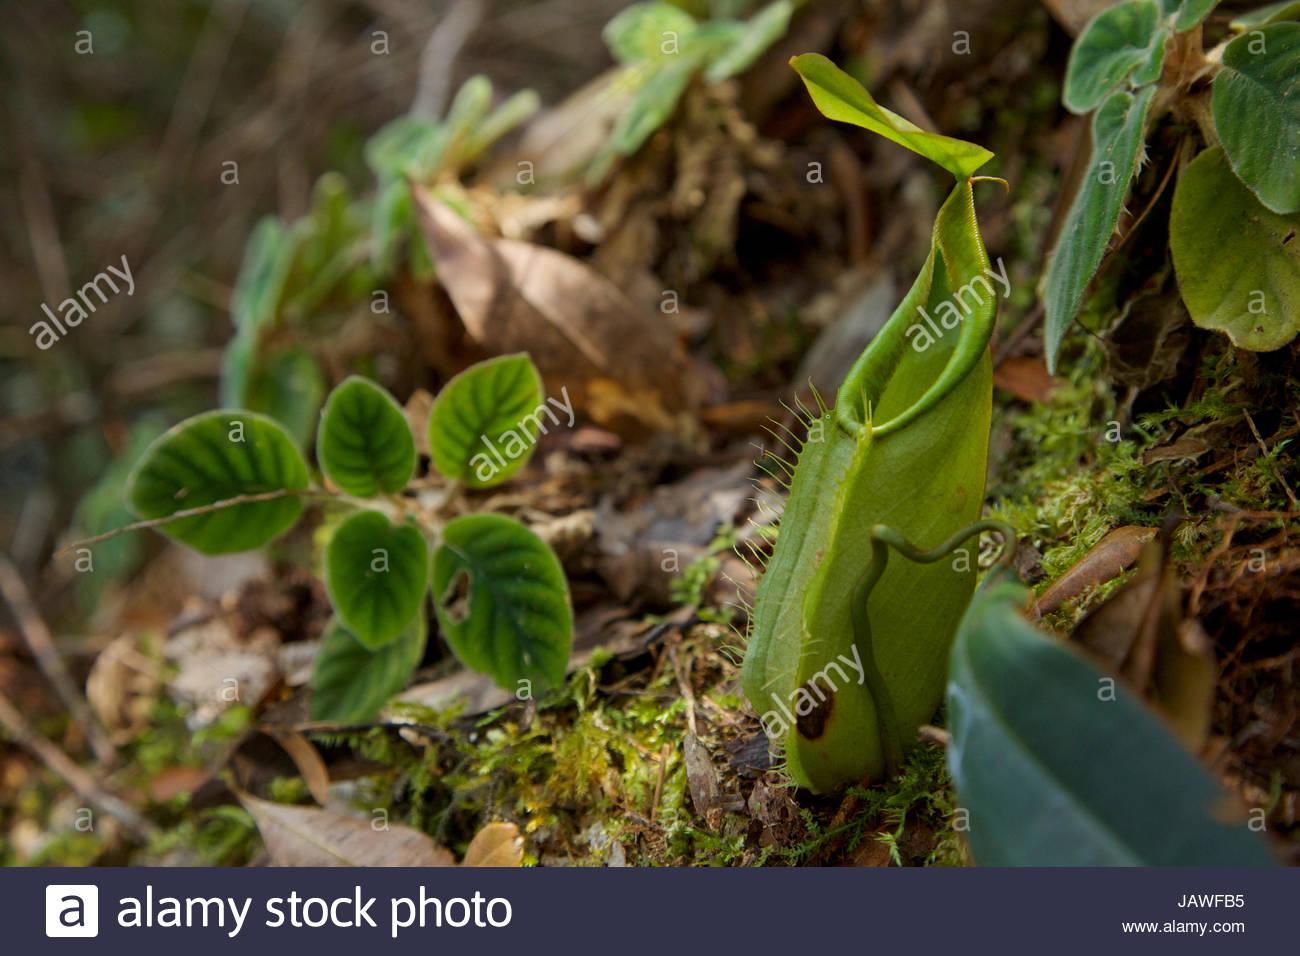 Eine Kannenpflanze Nepenthes Arten, in den oberen montane Wald des Mount Palung. Stockbild